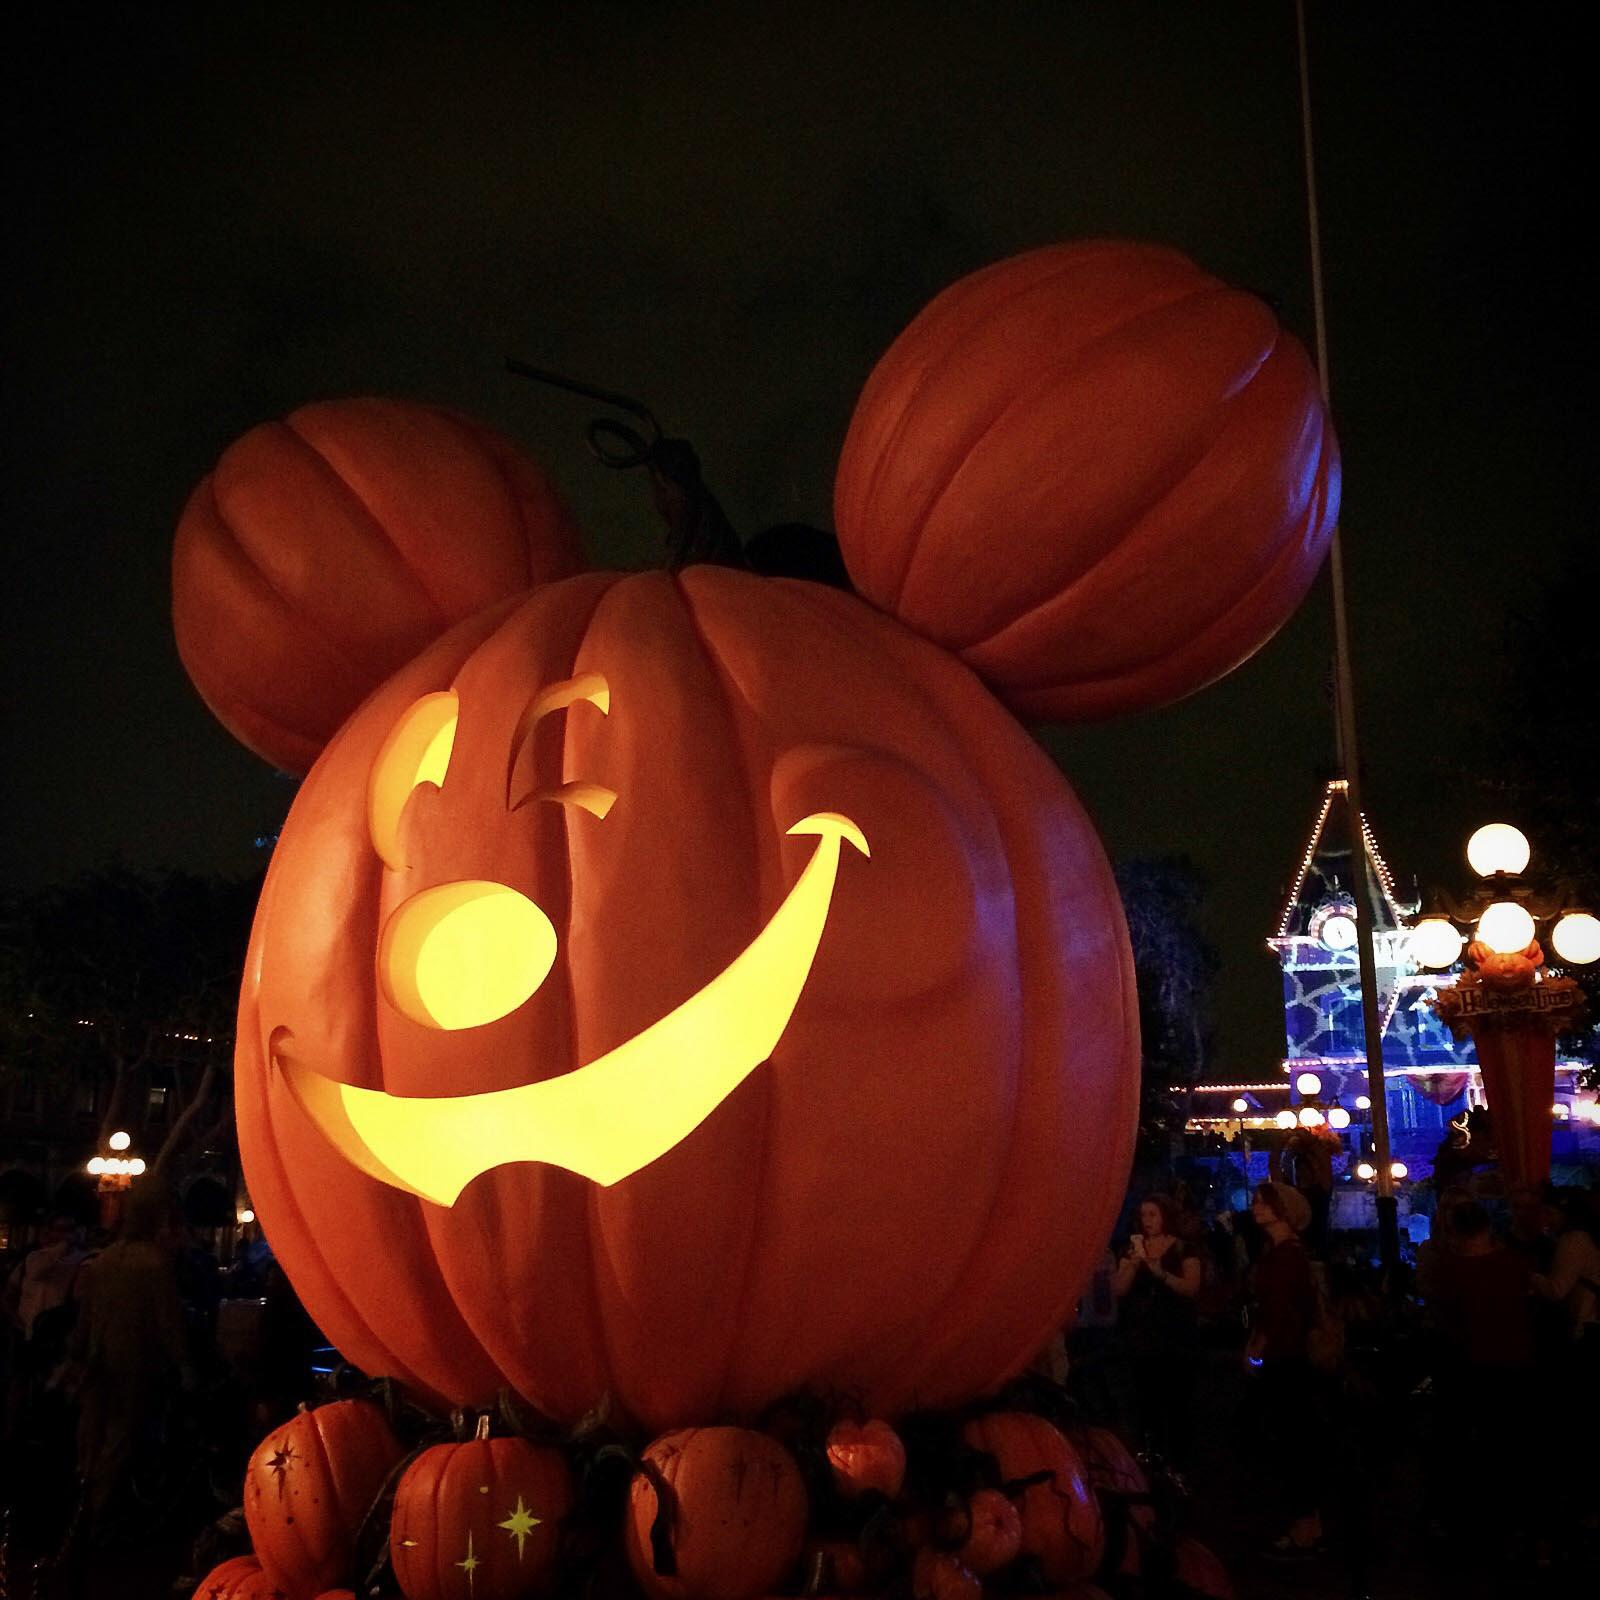 Disneyland Mickey Pumpkin at Night Time